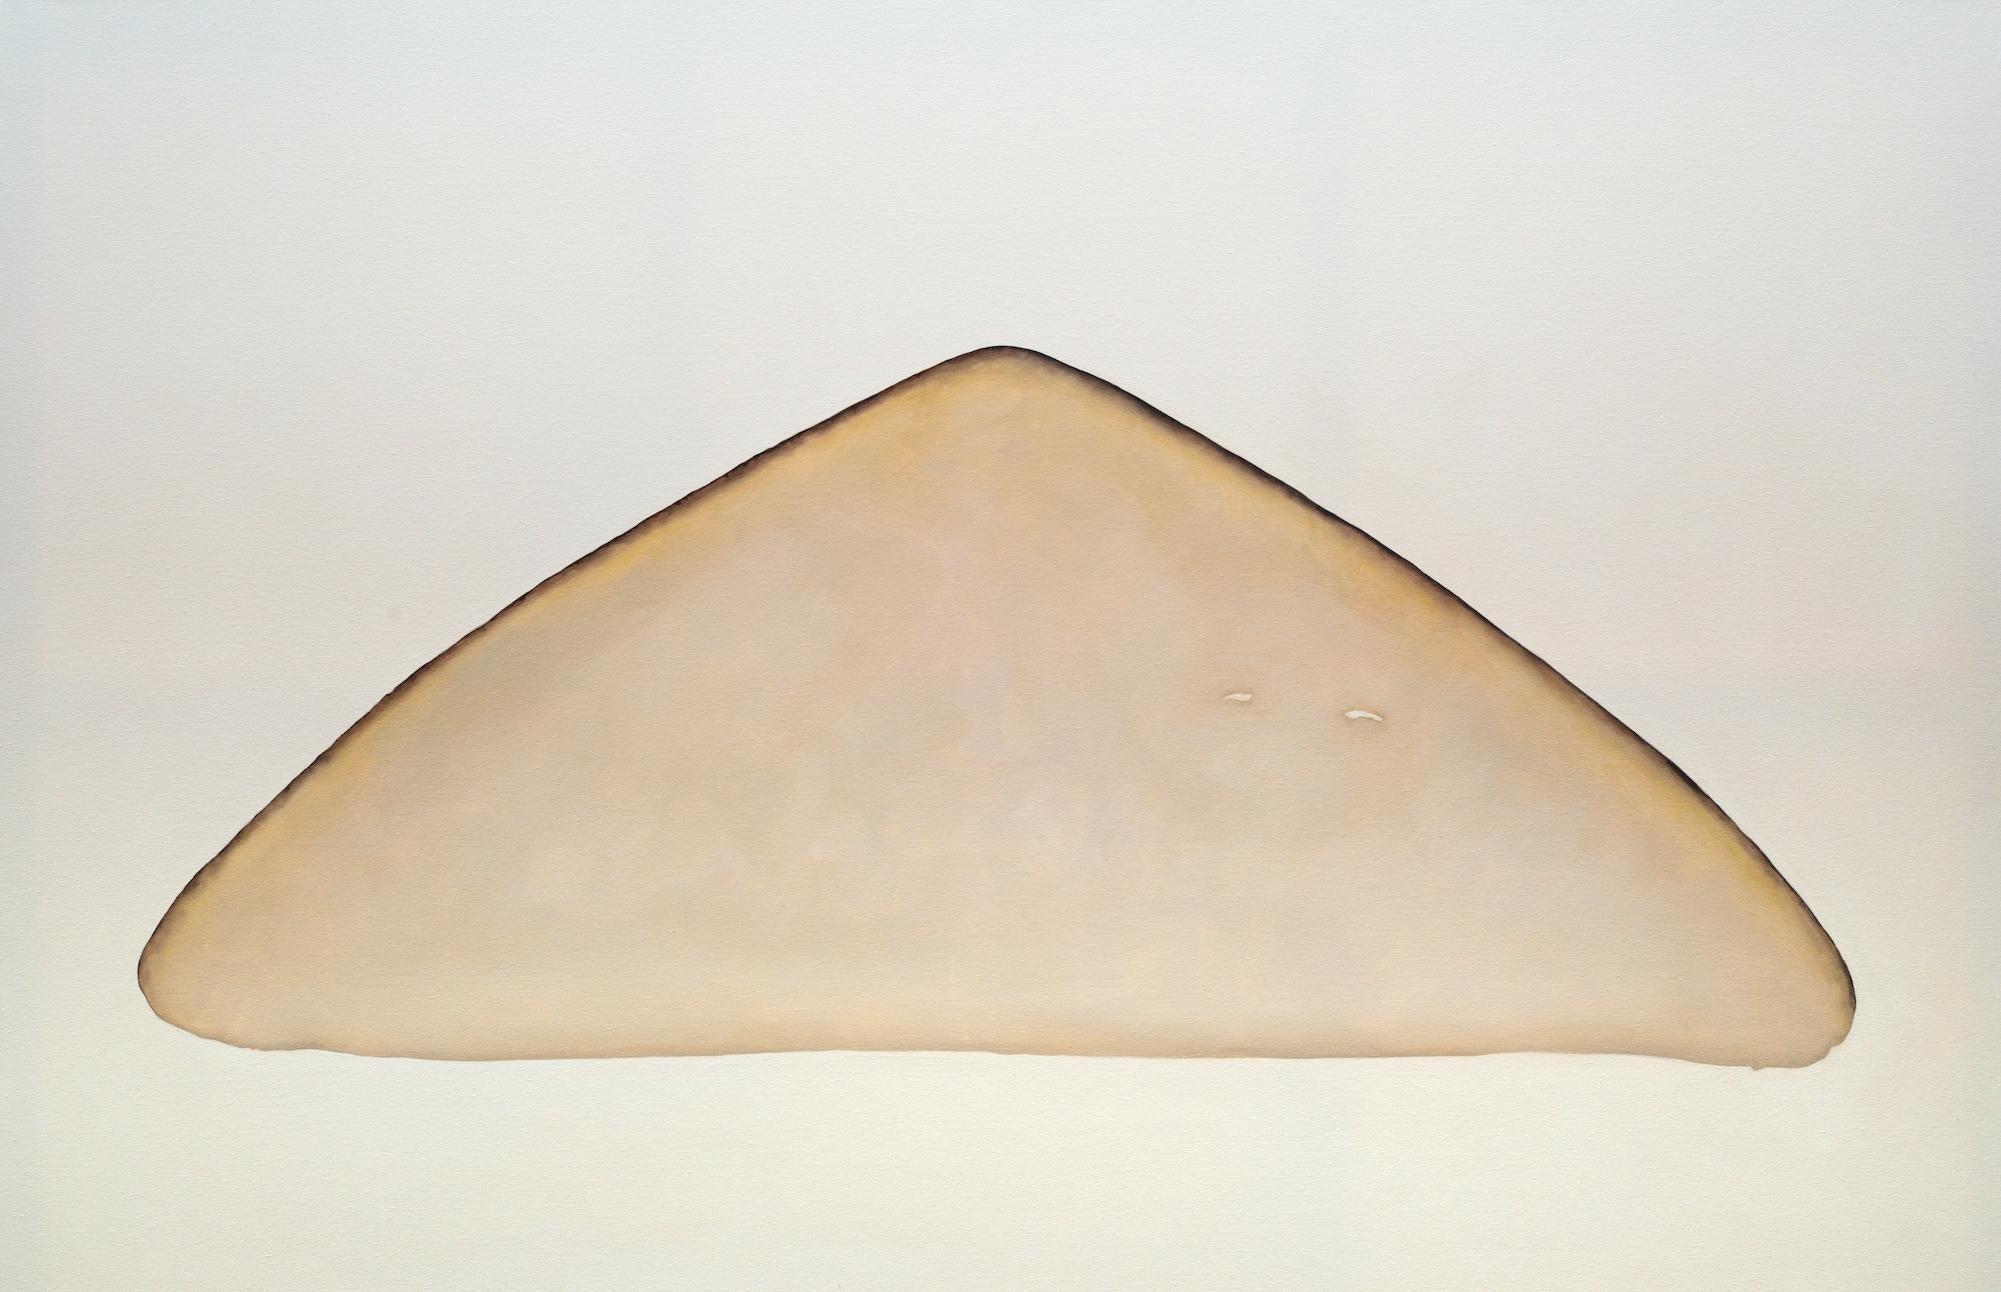 """Untitled 2"" Oil Painting 54"" x 79"" inch by Gayatri Gamuz"